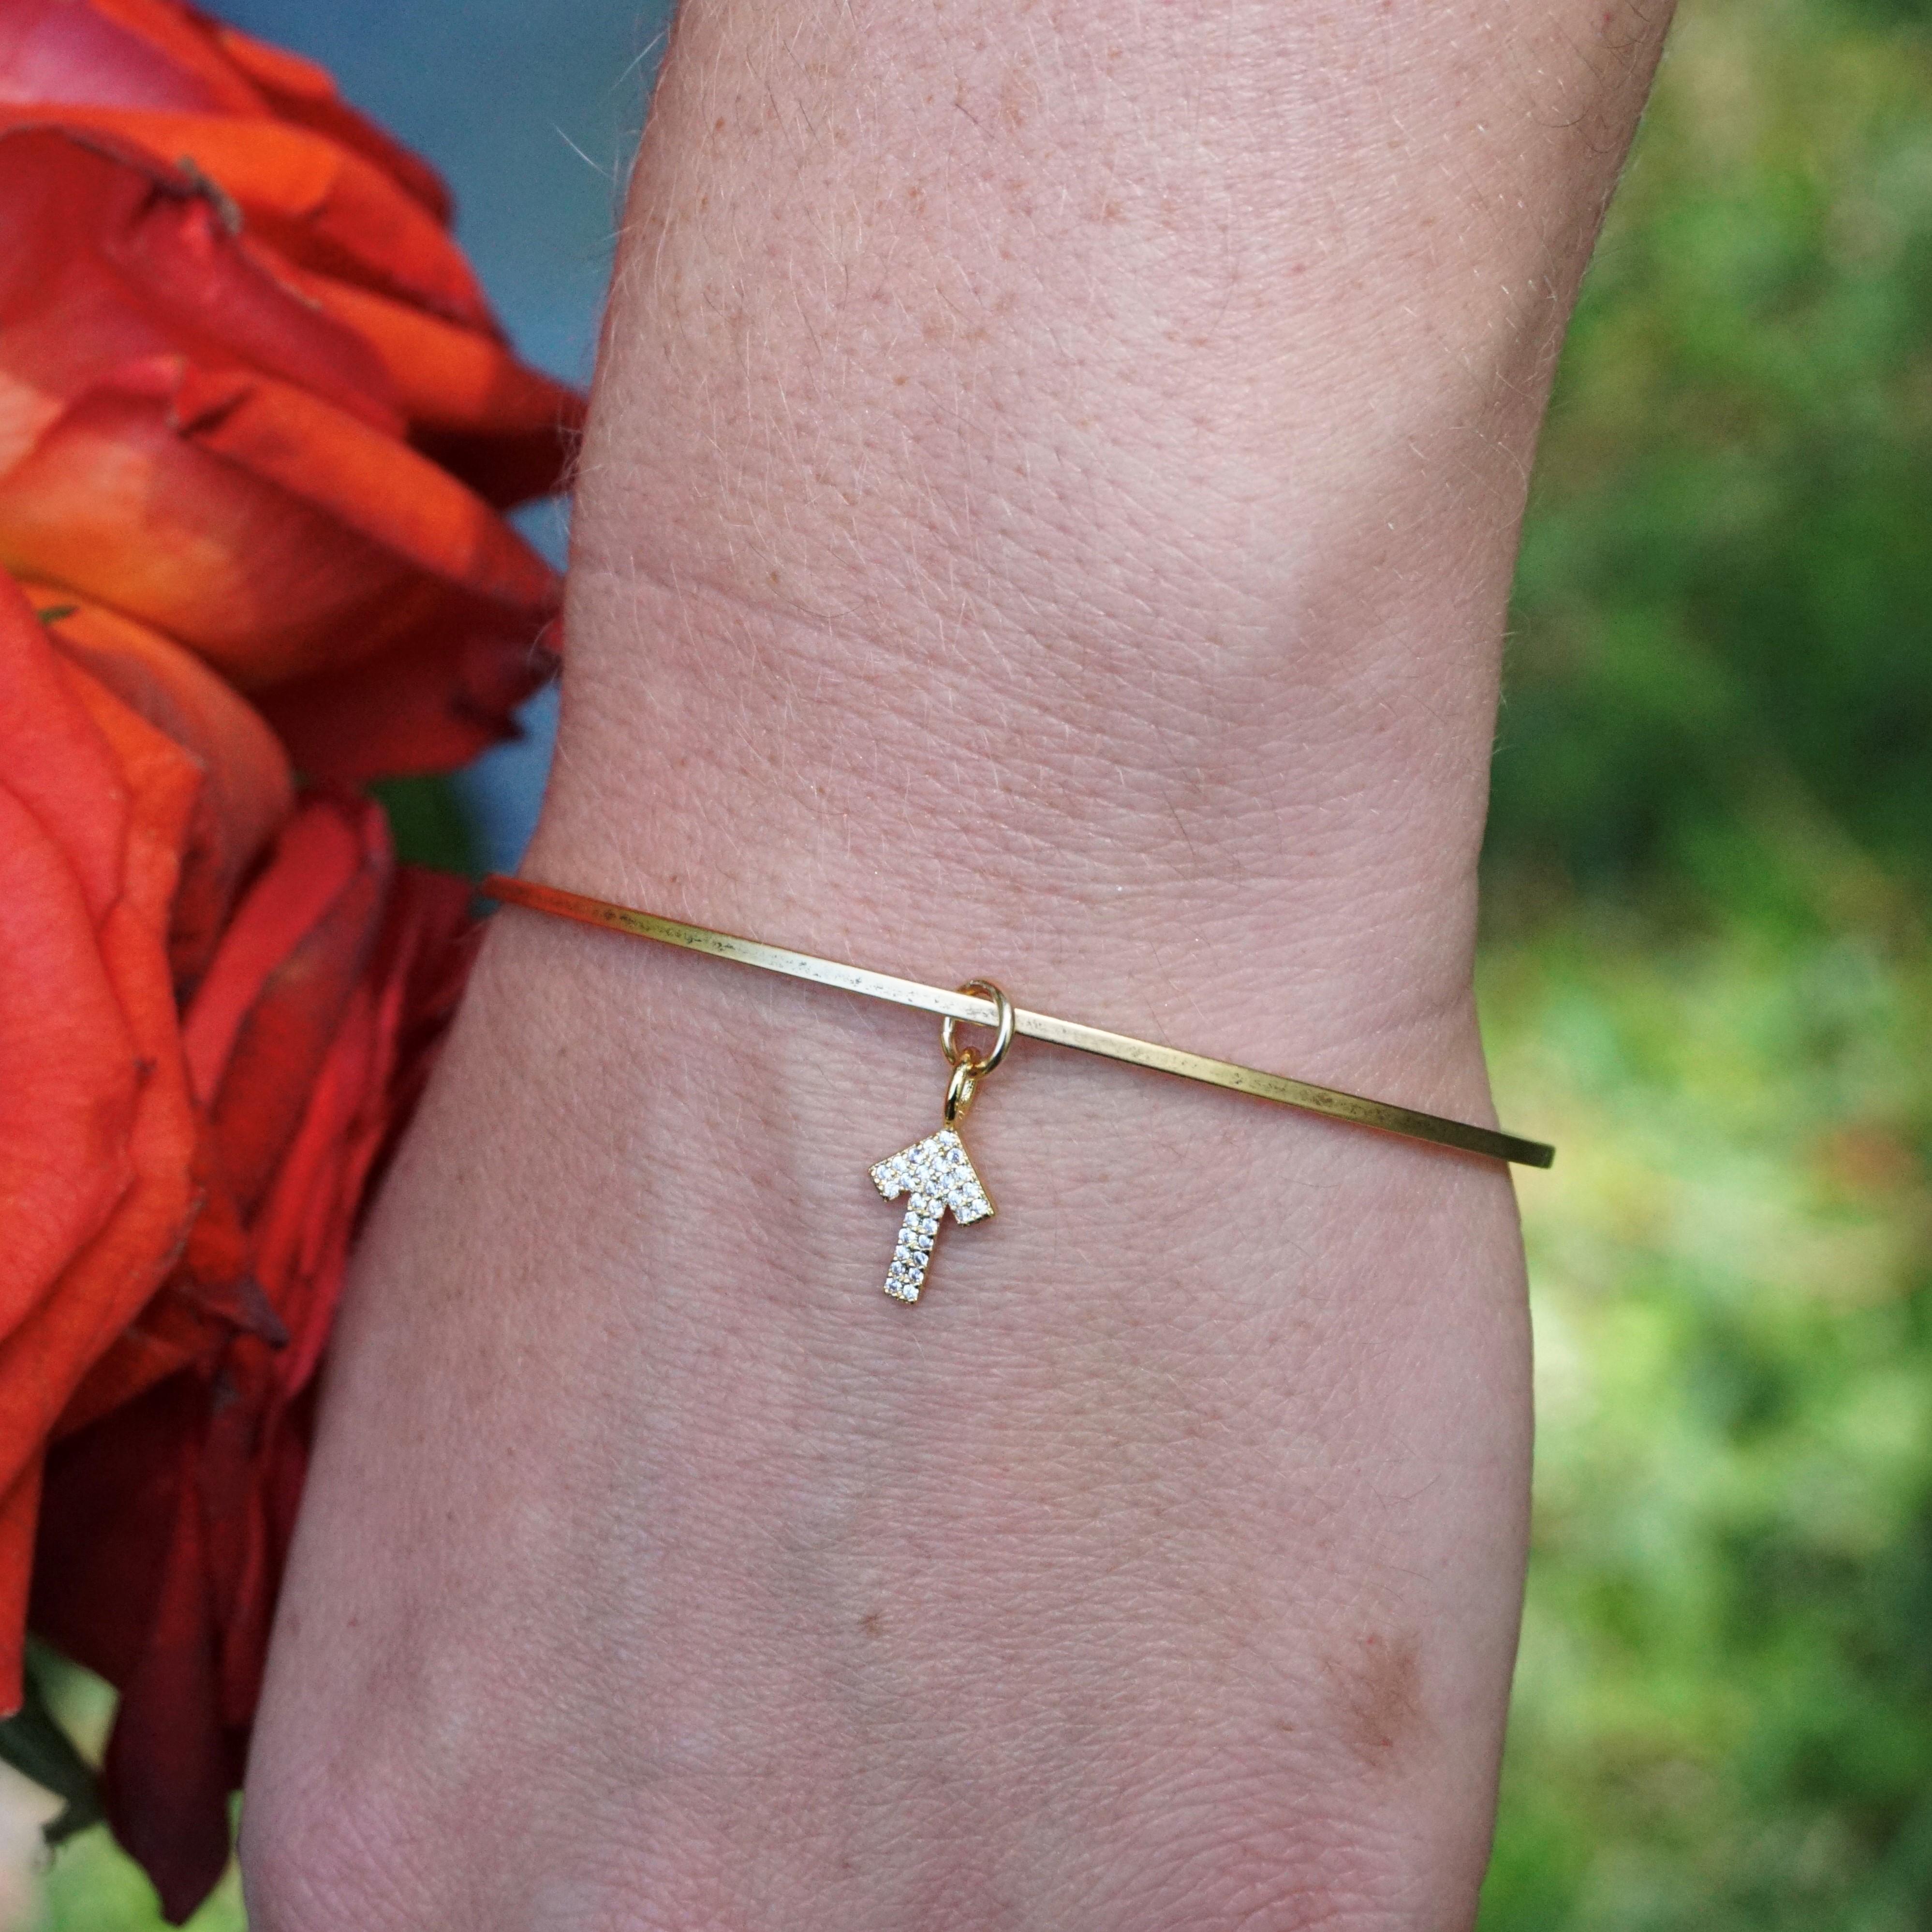 Golden Thread Radiant Courage Bracelet